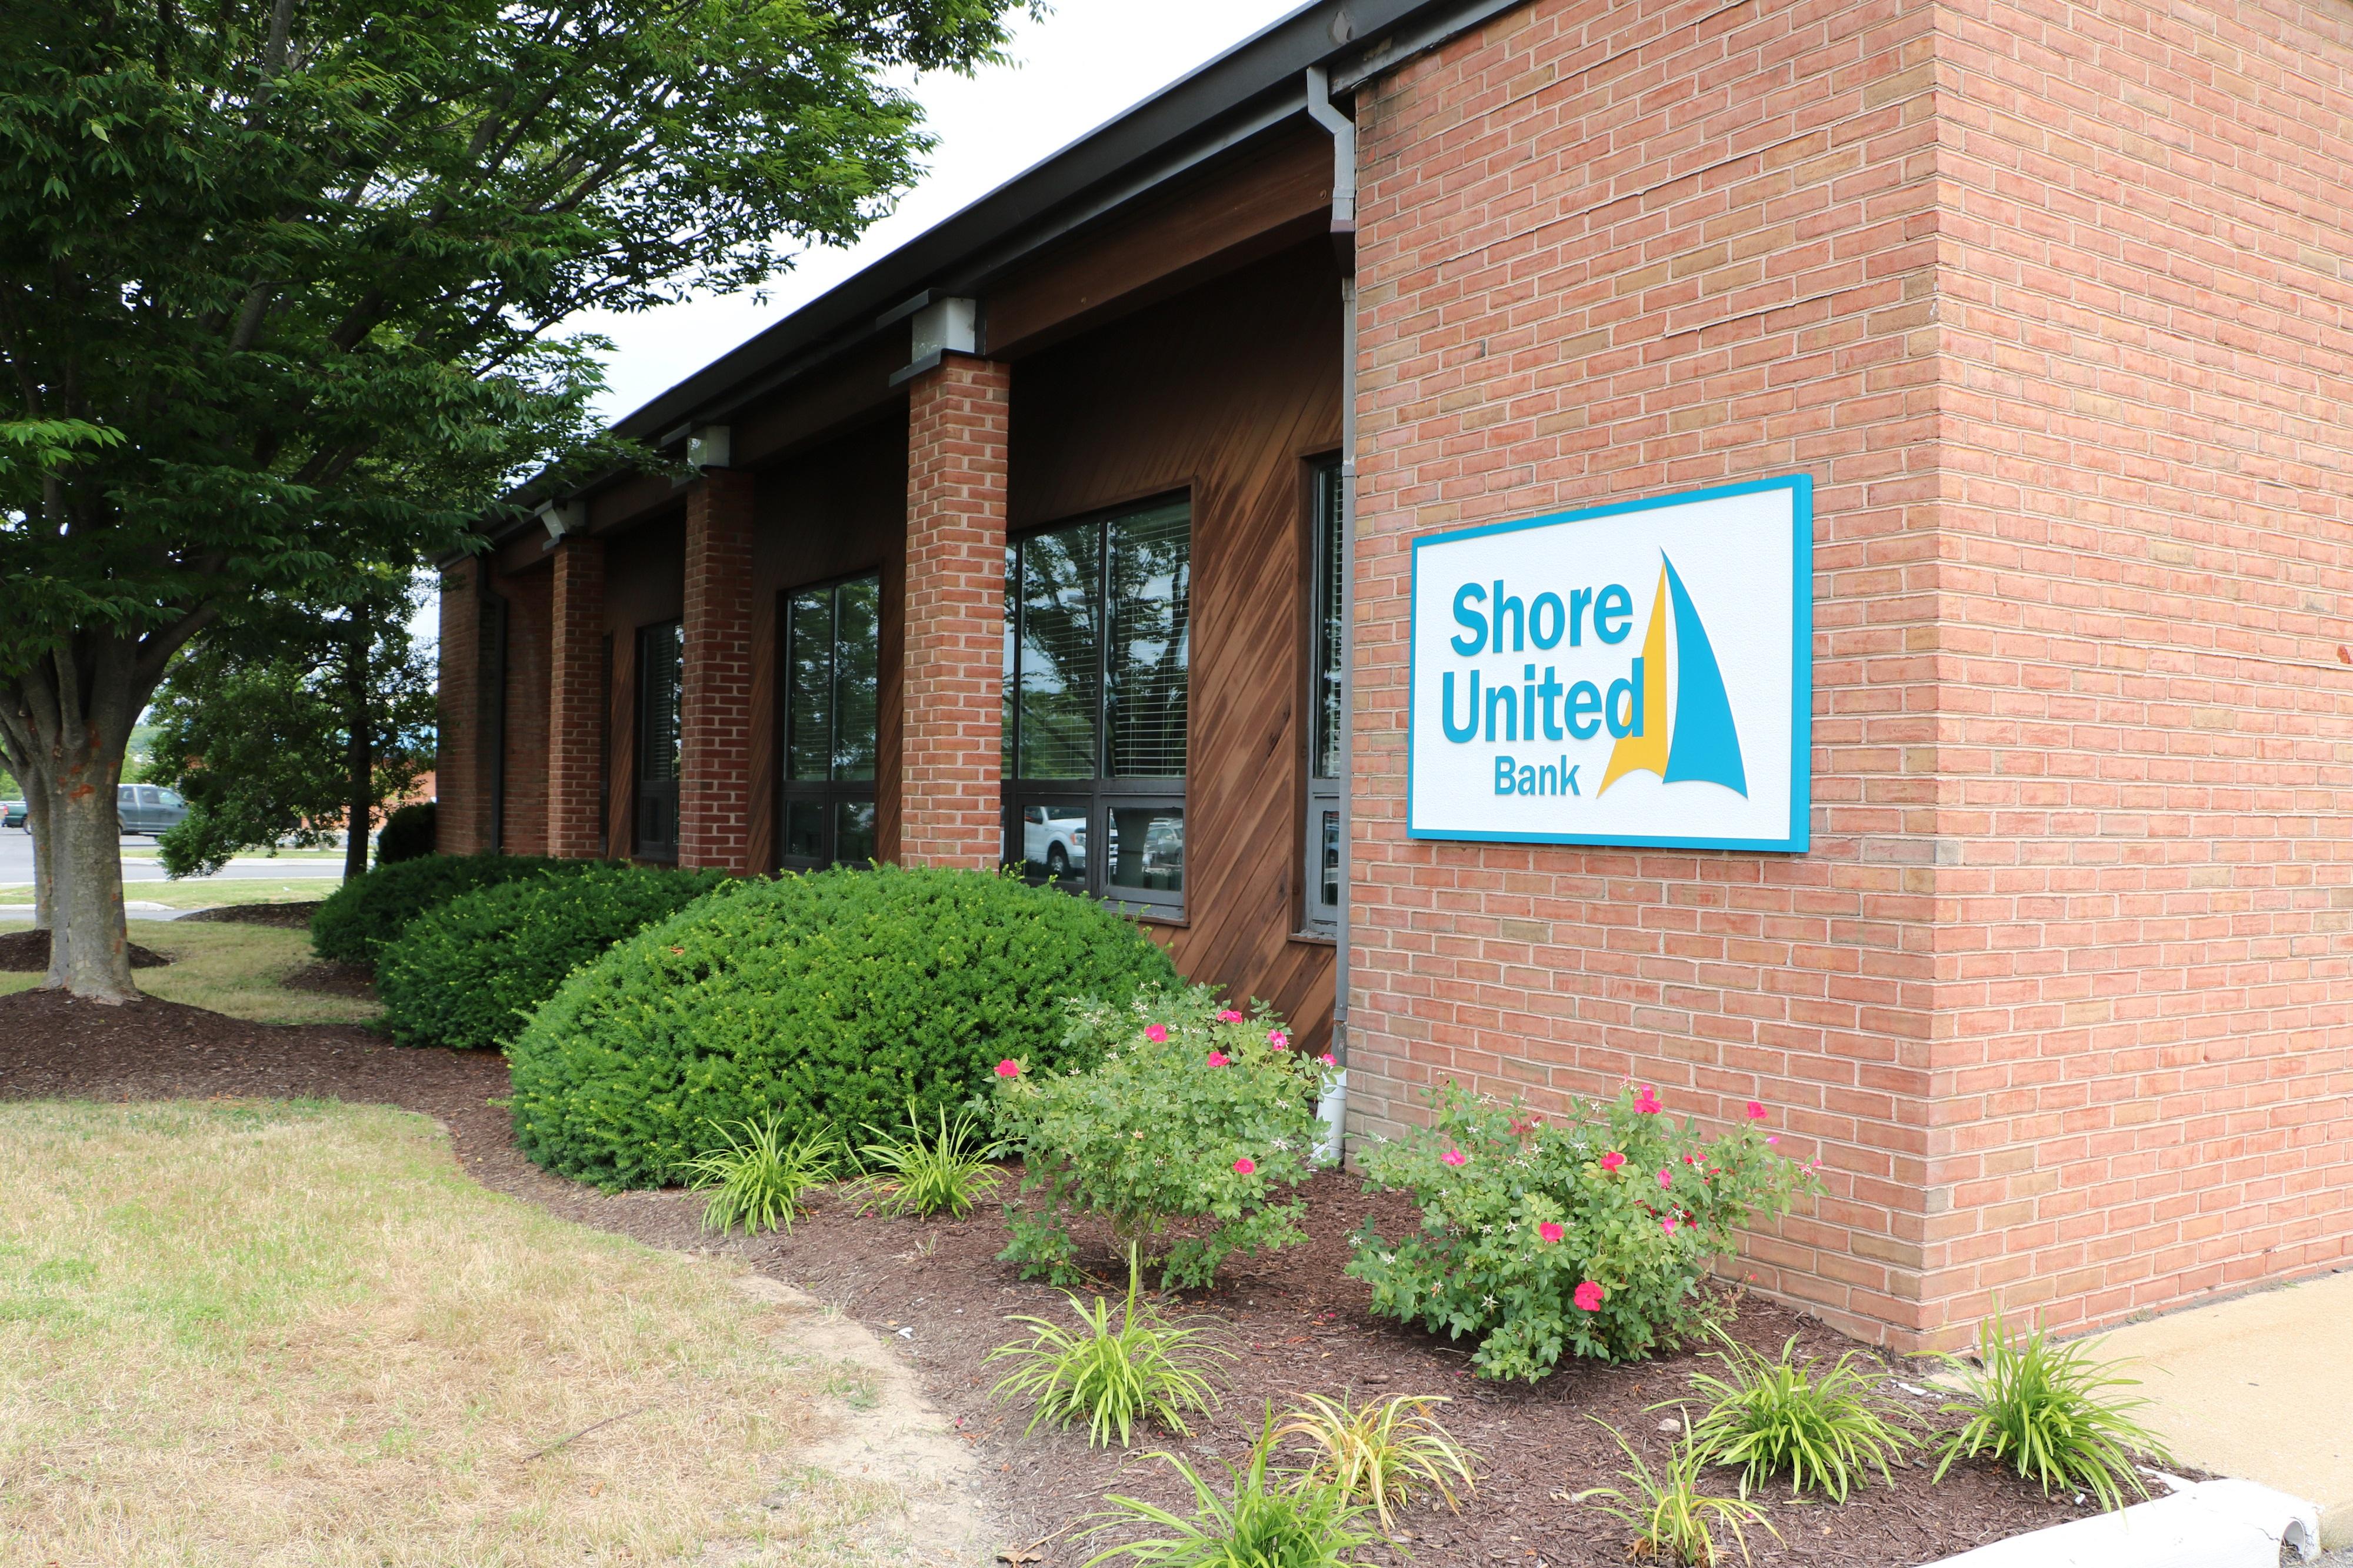 Shore United Bank image 1